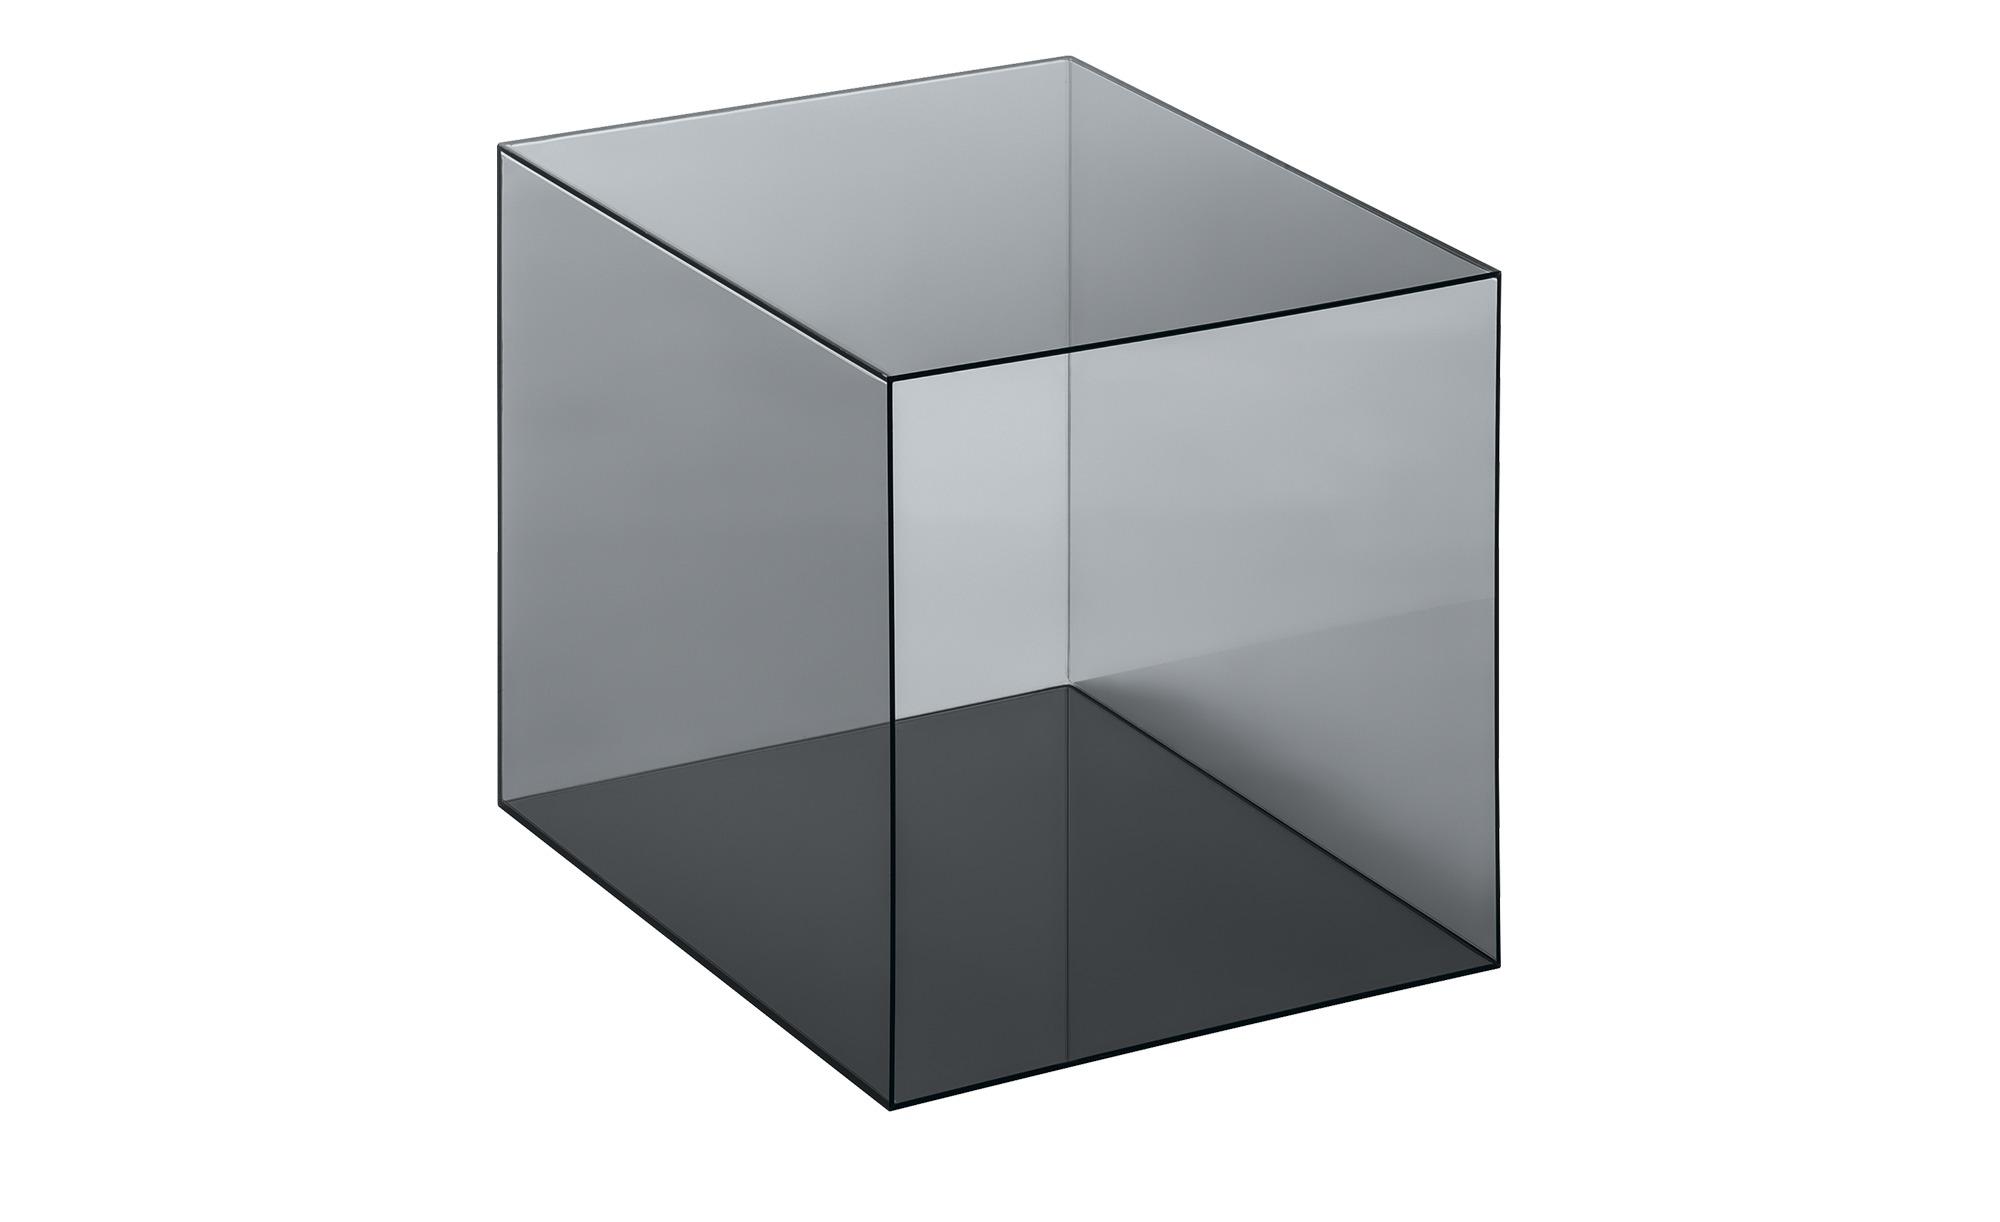 #now! by hülsta Acrylglasbox  now! for you ¦ Maße (cm): B: 33,9 H: 33,9 T: 40,1 Sonstiges Zubehör – Höffner#